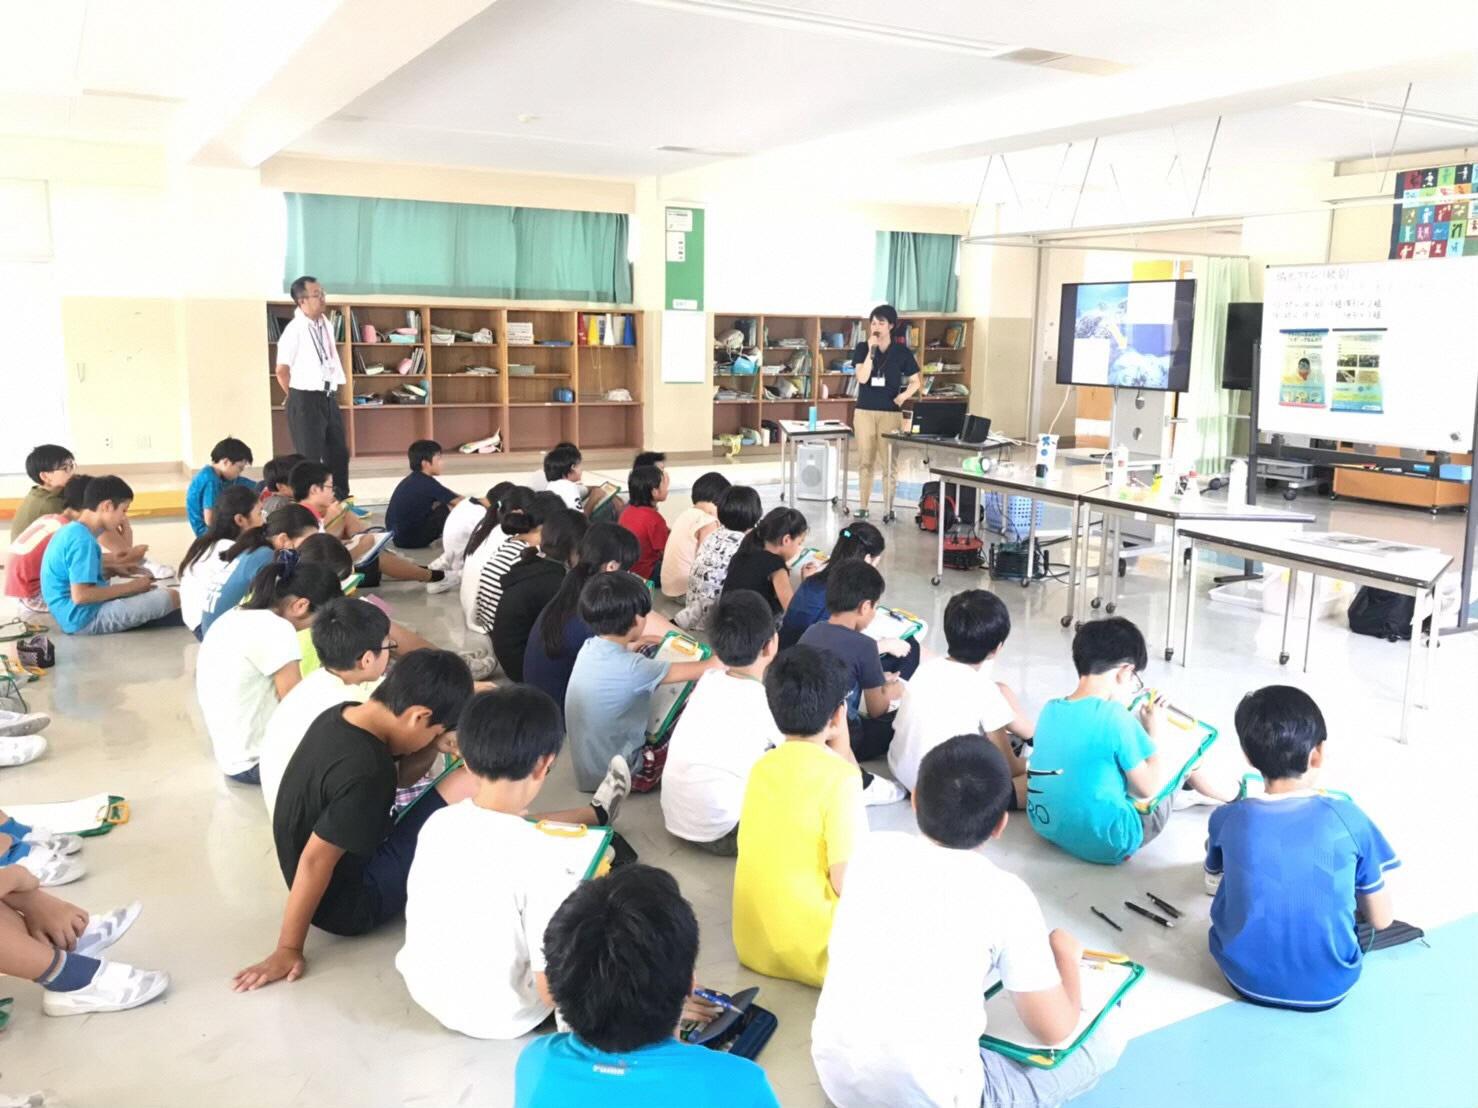 http://www.shizutan.jp/ondanka/event/2020/01/06/images/IMG-3970.JPG